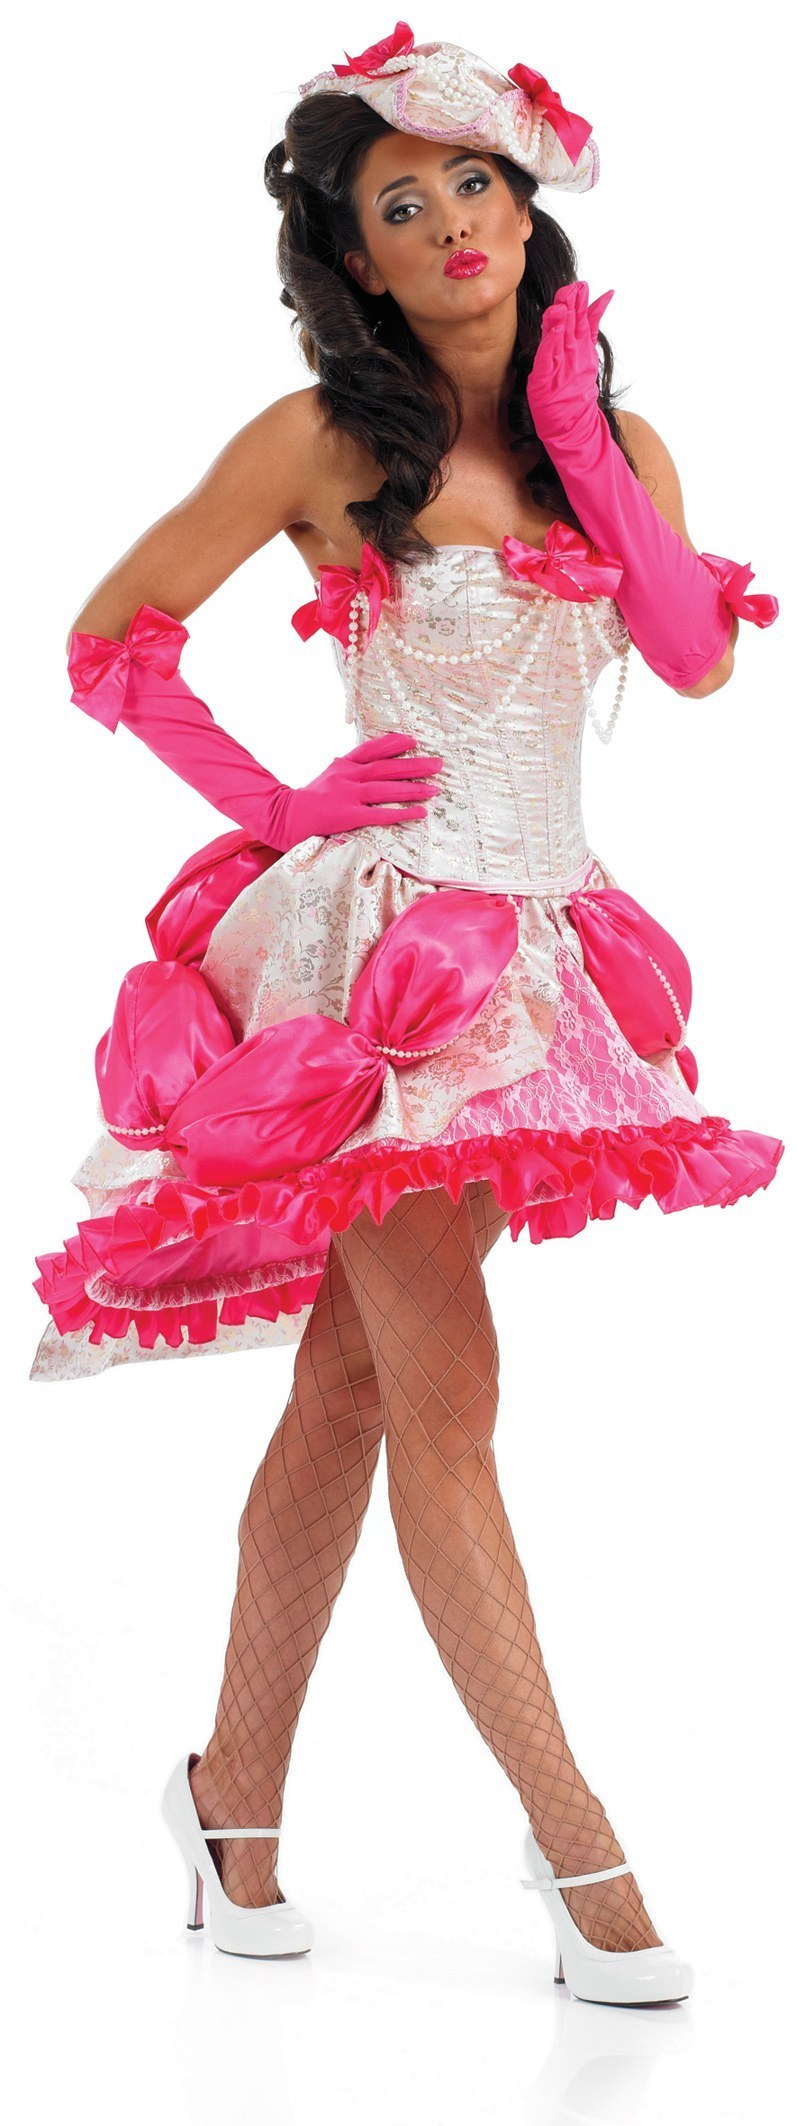 Barbie Christmas Dress